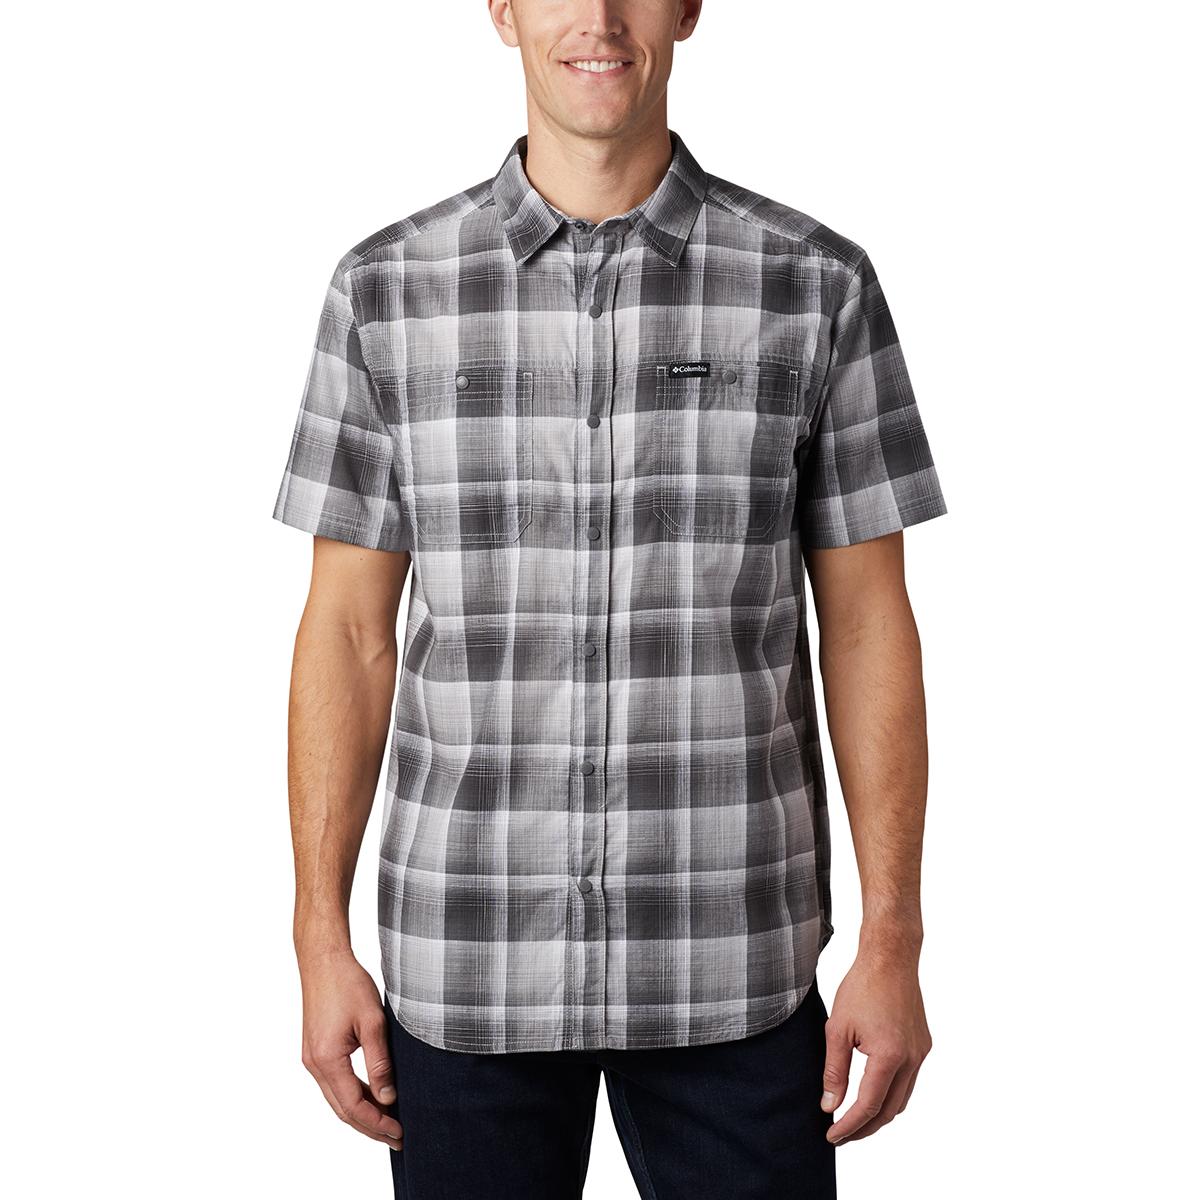 Columbia Men's Short-Sleeve Leadville Ridge Ii Button-Down Shirt - Black, M